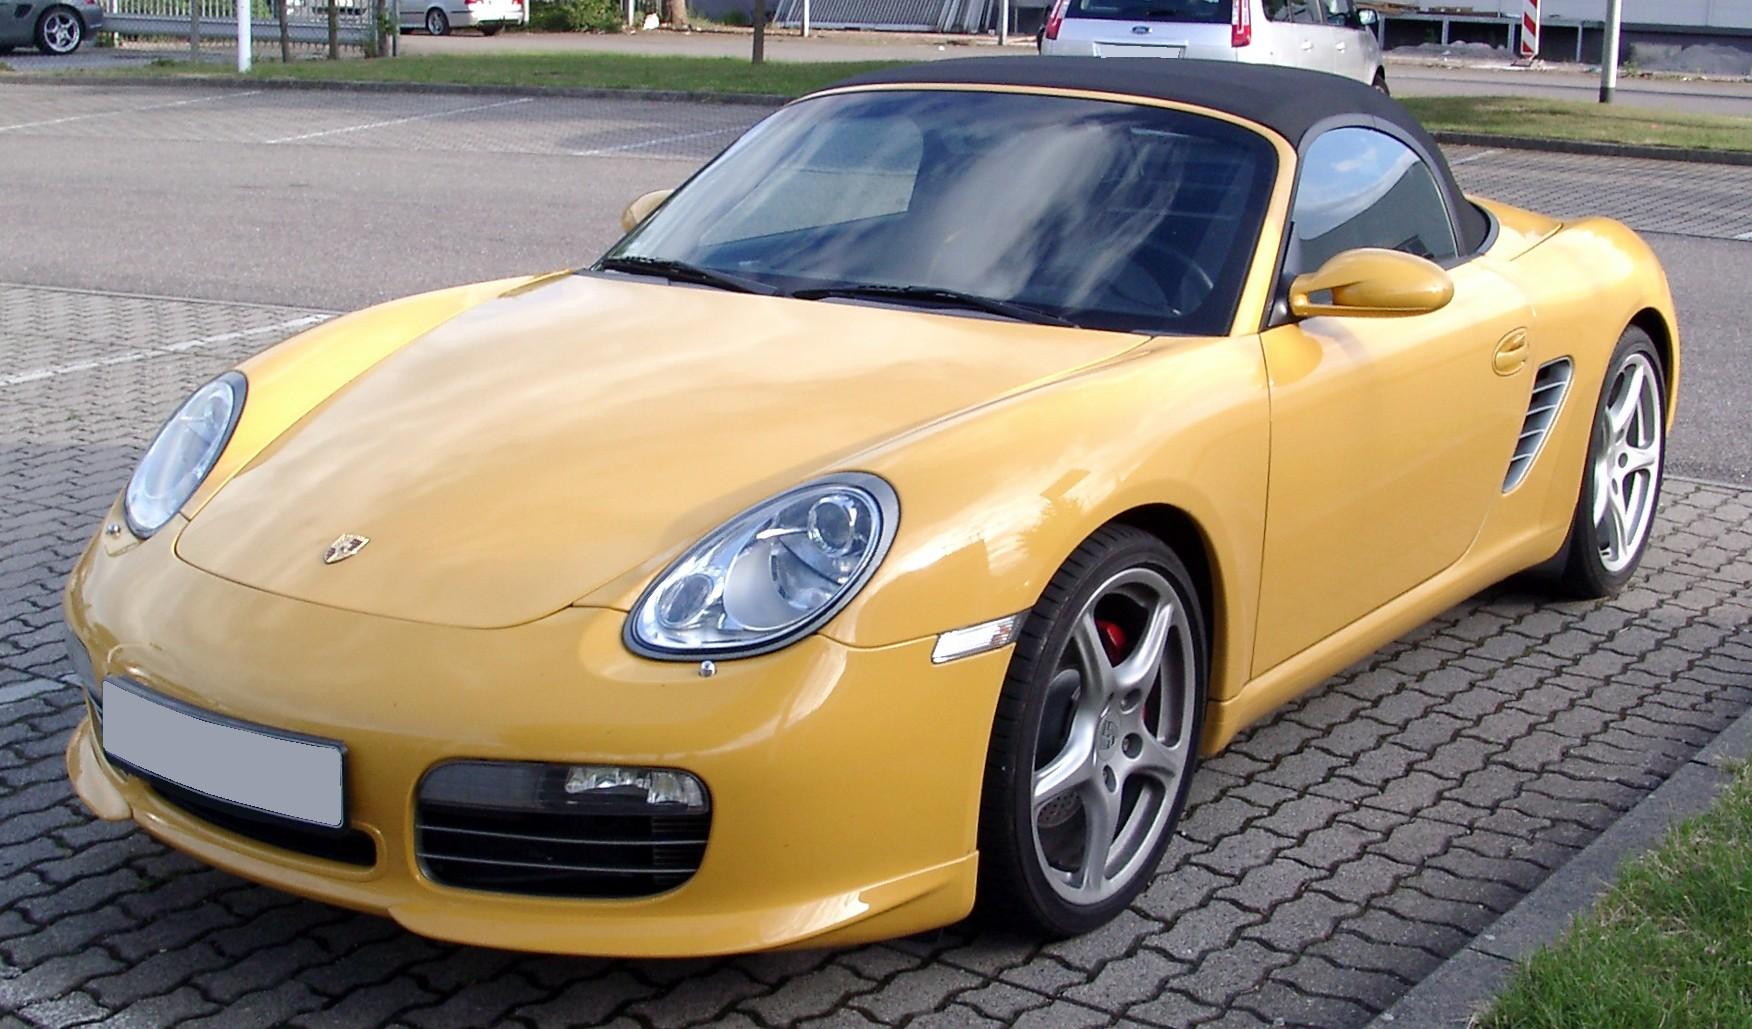 File:Porsche Boxster front 20080612.jpg - Wikimedia Commons